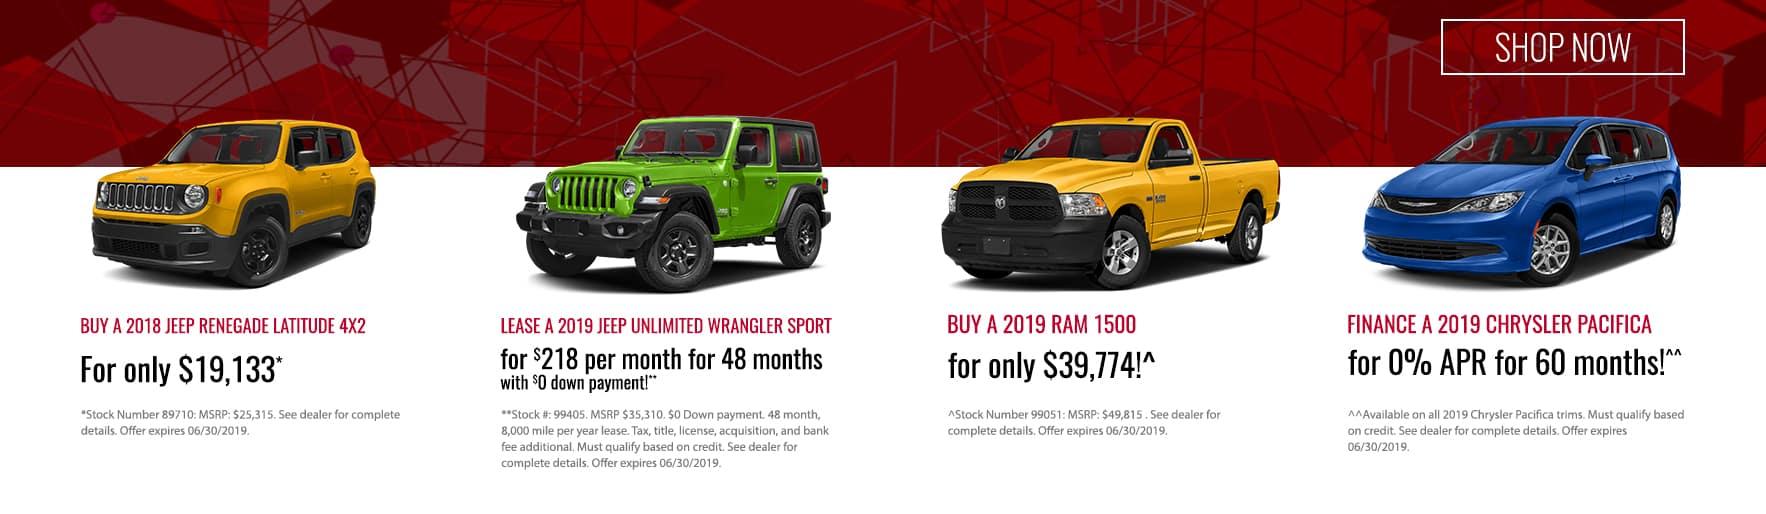 Auffenberg Chrysler Dodge Jeep Ram Offers